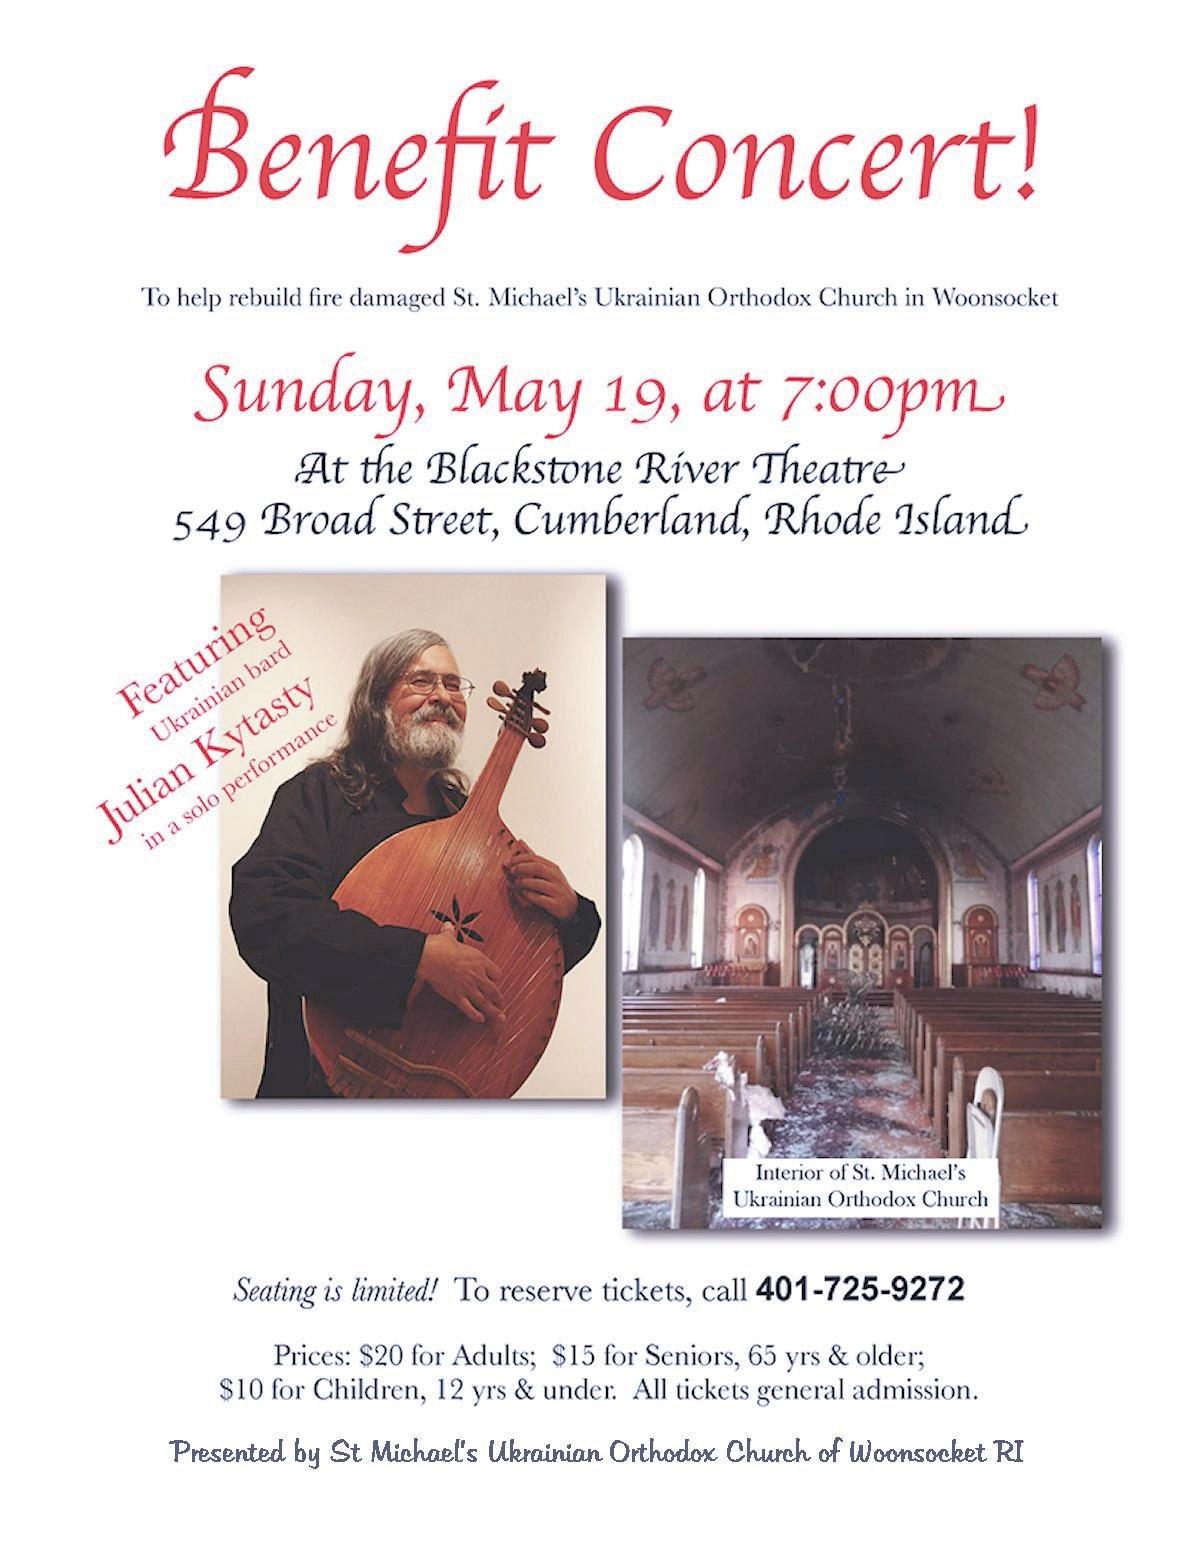 00 Benefit Concert. St Michael UOC. Woonsocket RI. 18.05.13